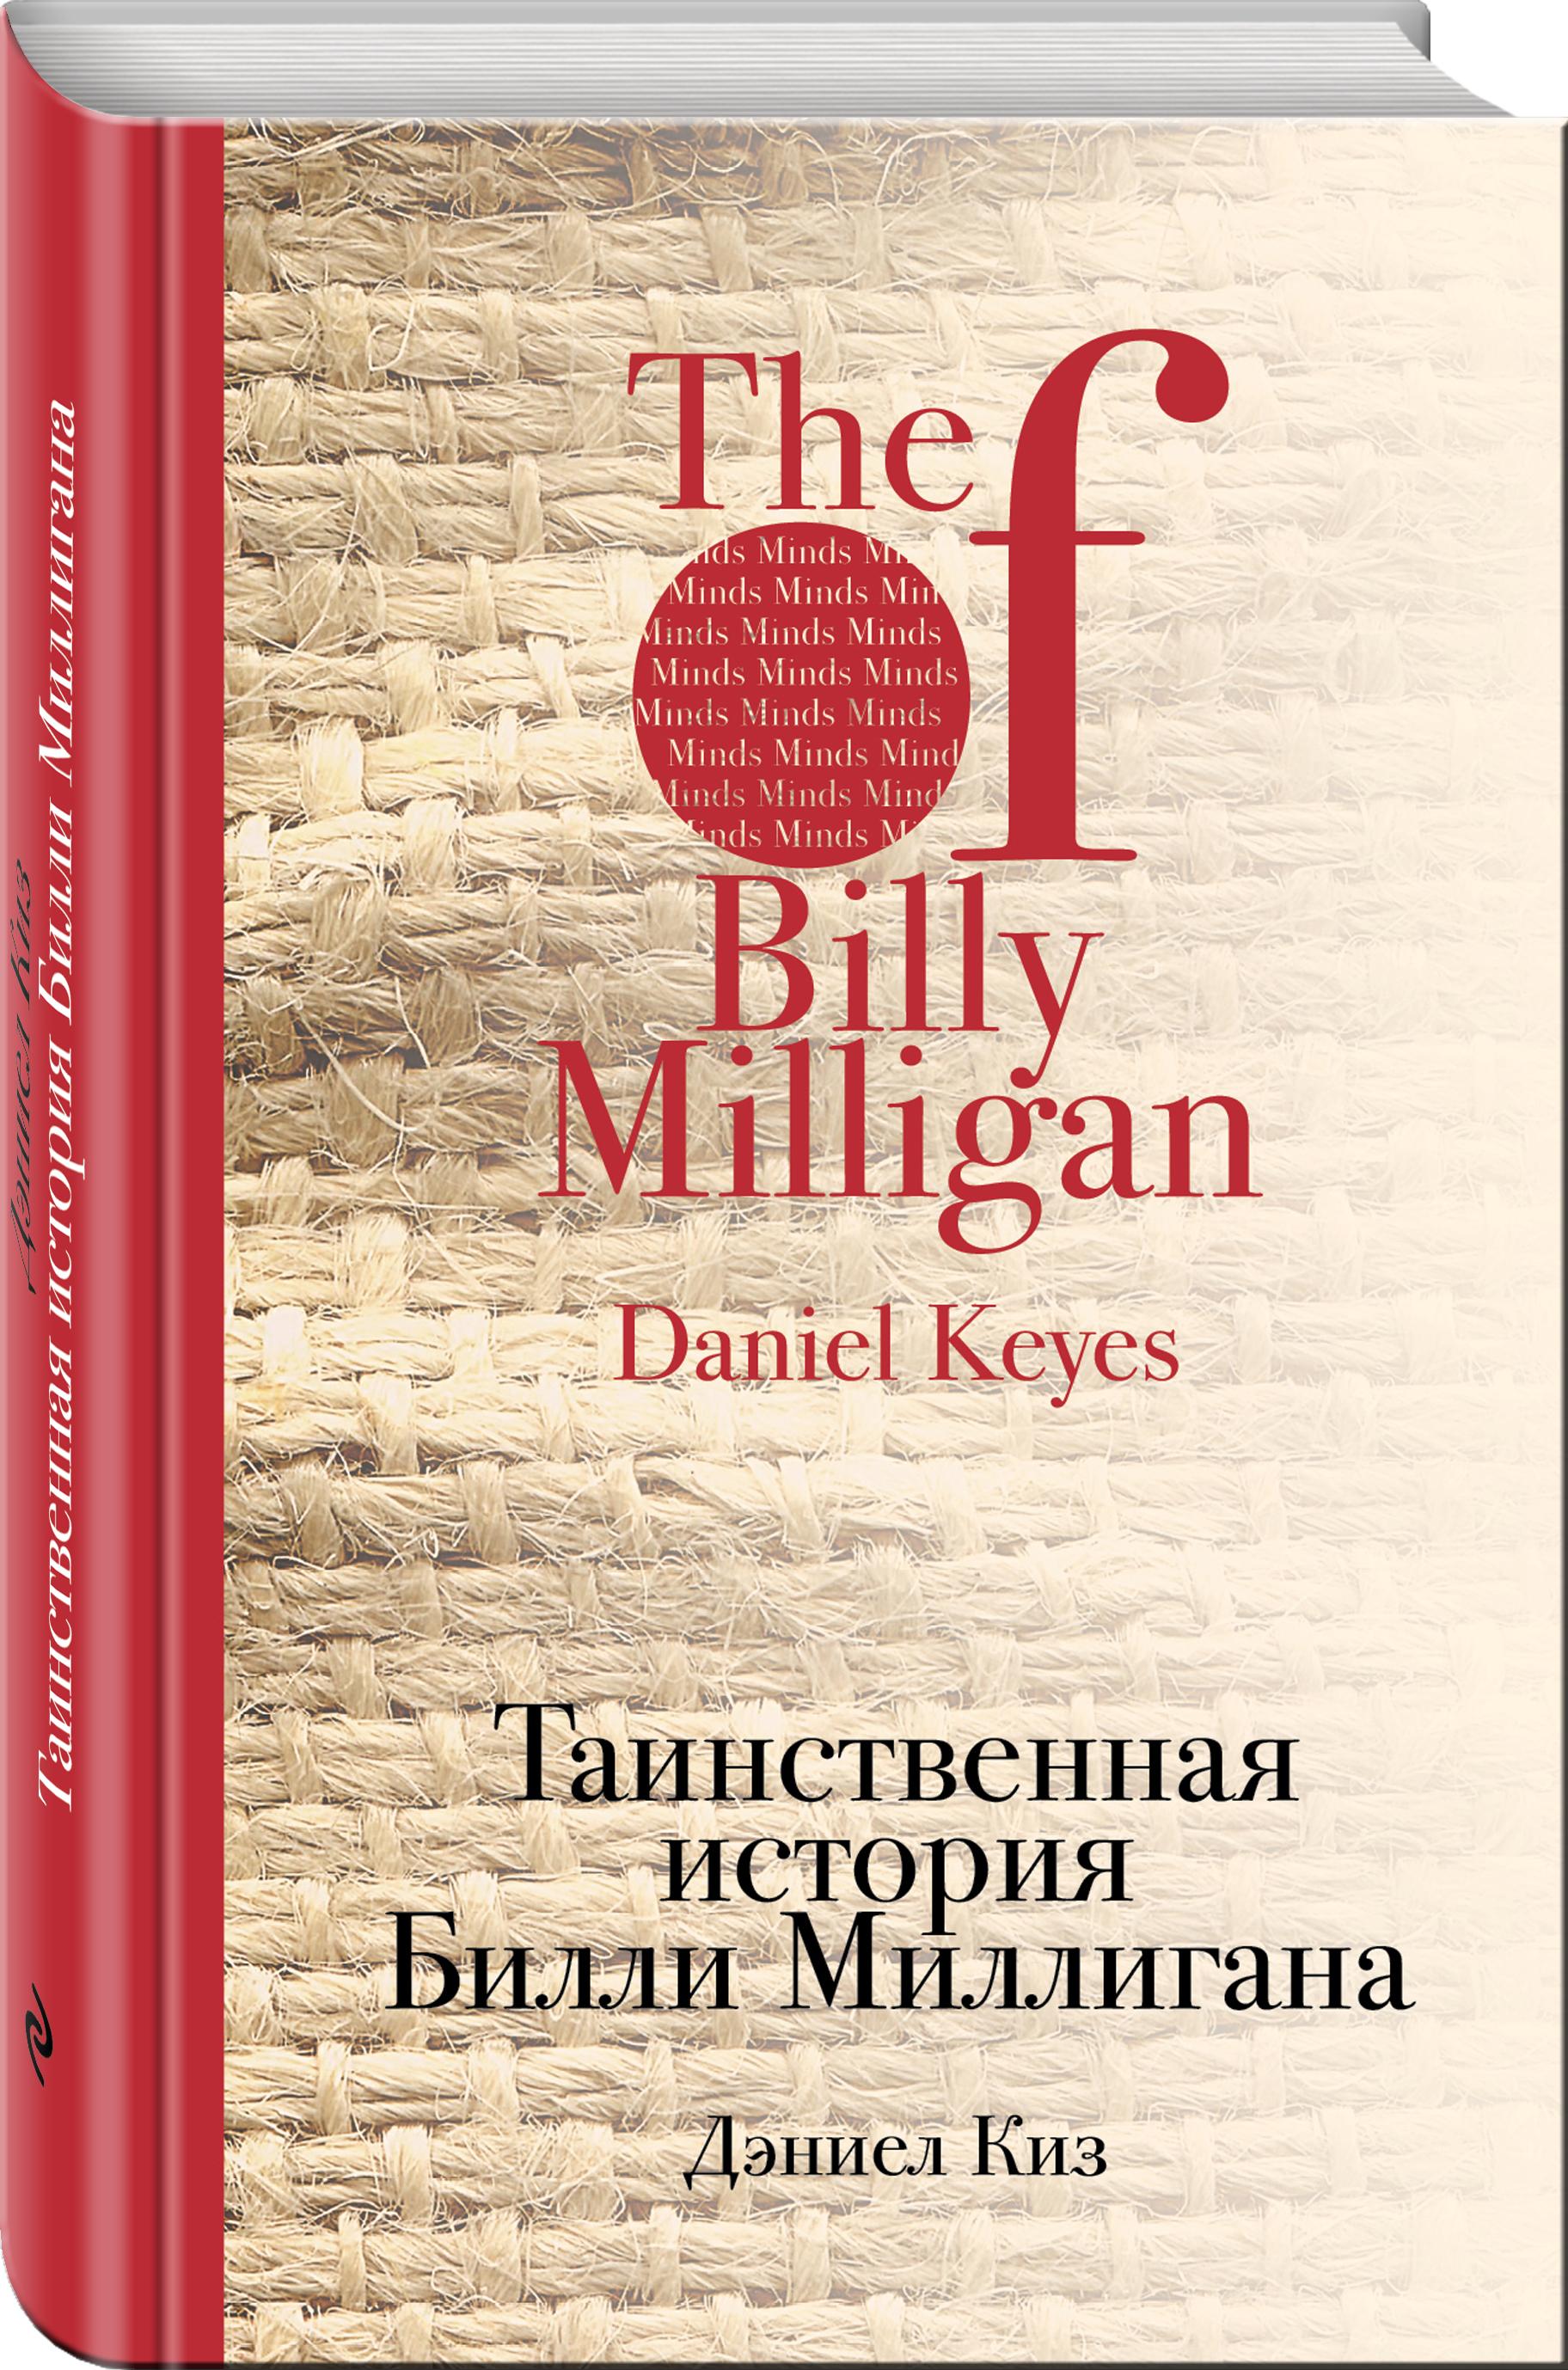 Киз Д. Таинственная история Билли Миллигана билли